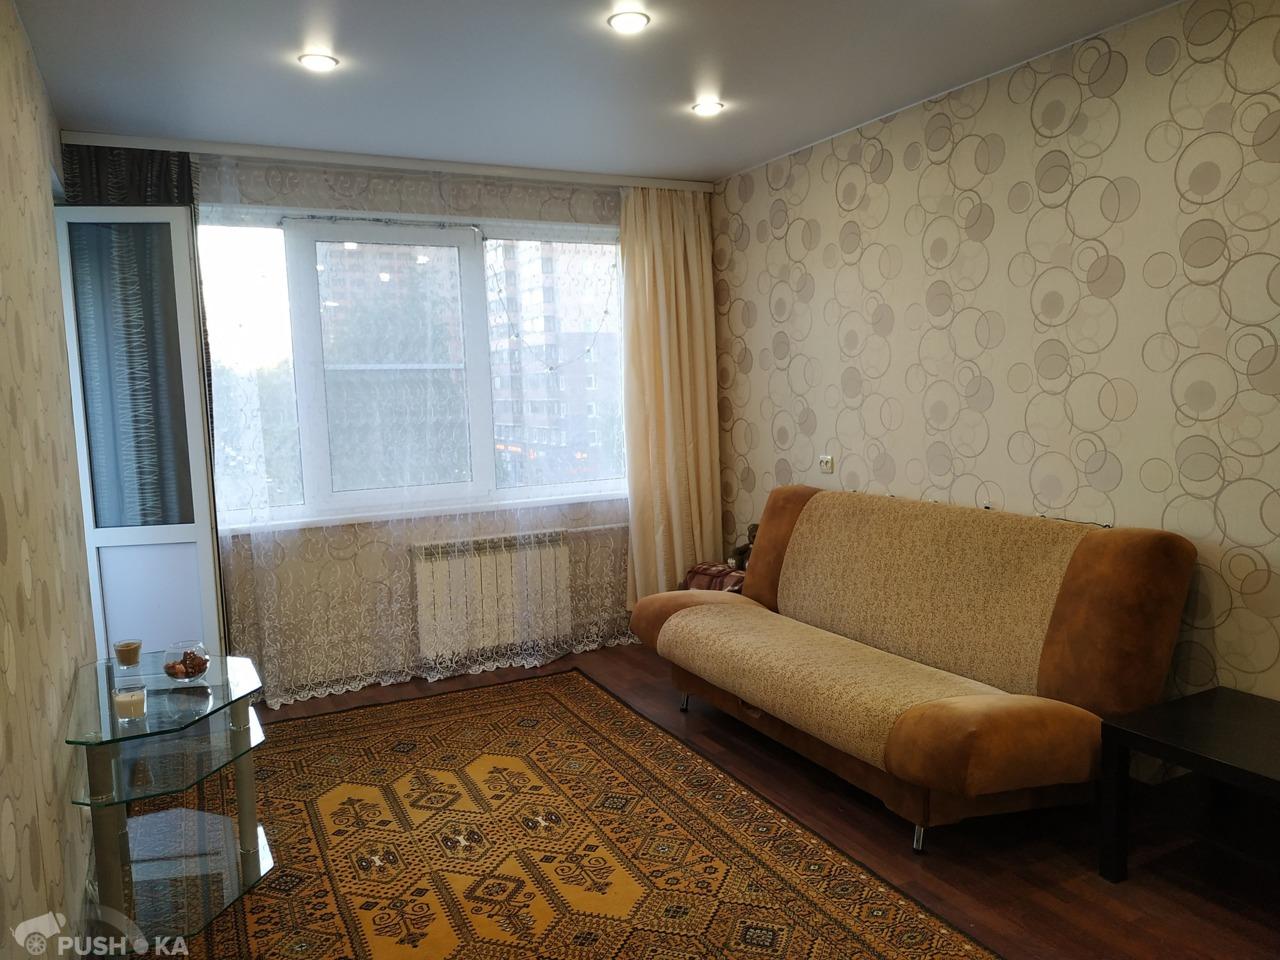 Сдаётся 1-комнатная квартира 34.0 кв.м. этаж 5/9 за 21 000 руб